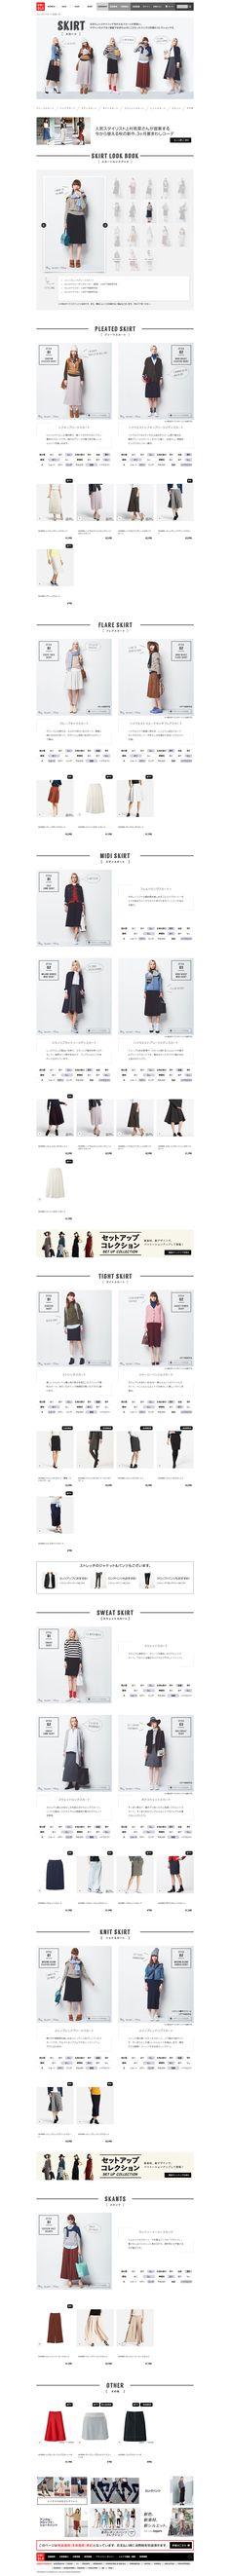 http://www.uniqlo.com/jp/store/feature/uq/skirt/women/#pleated